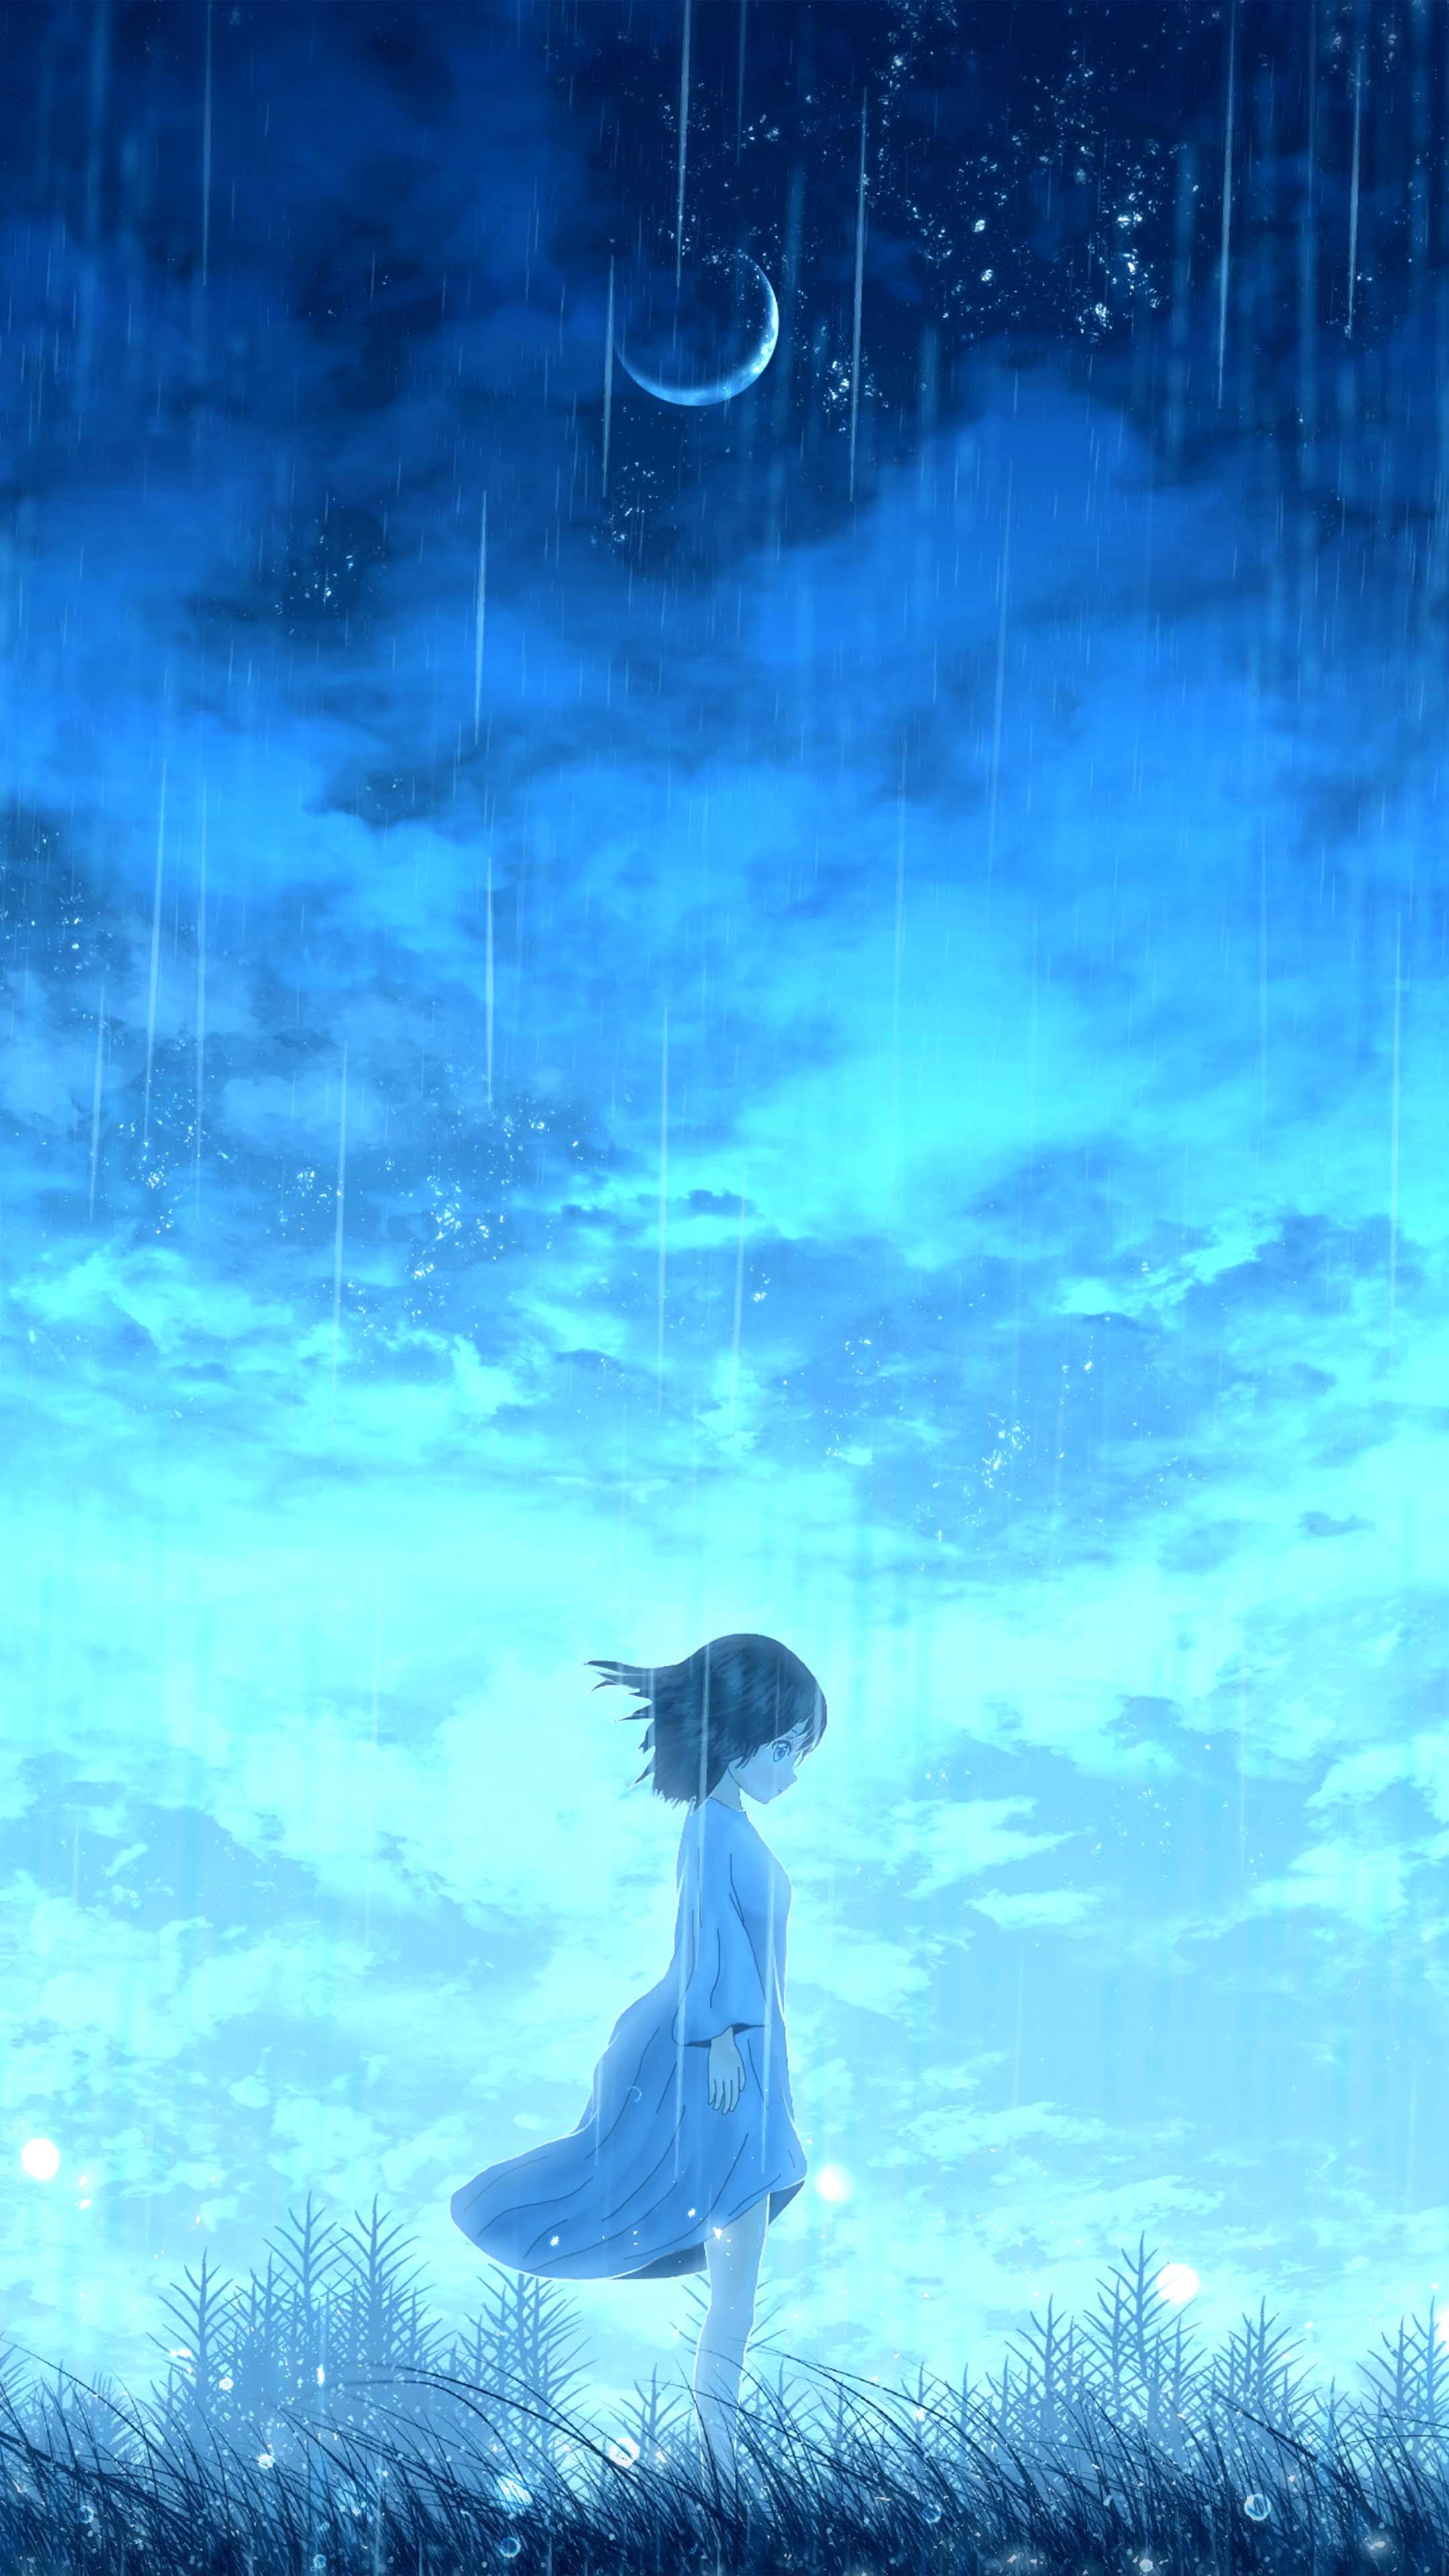 Anime Lonely Night Girl Free 4K Ultra HD Mobile Wallpaper